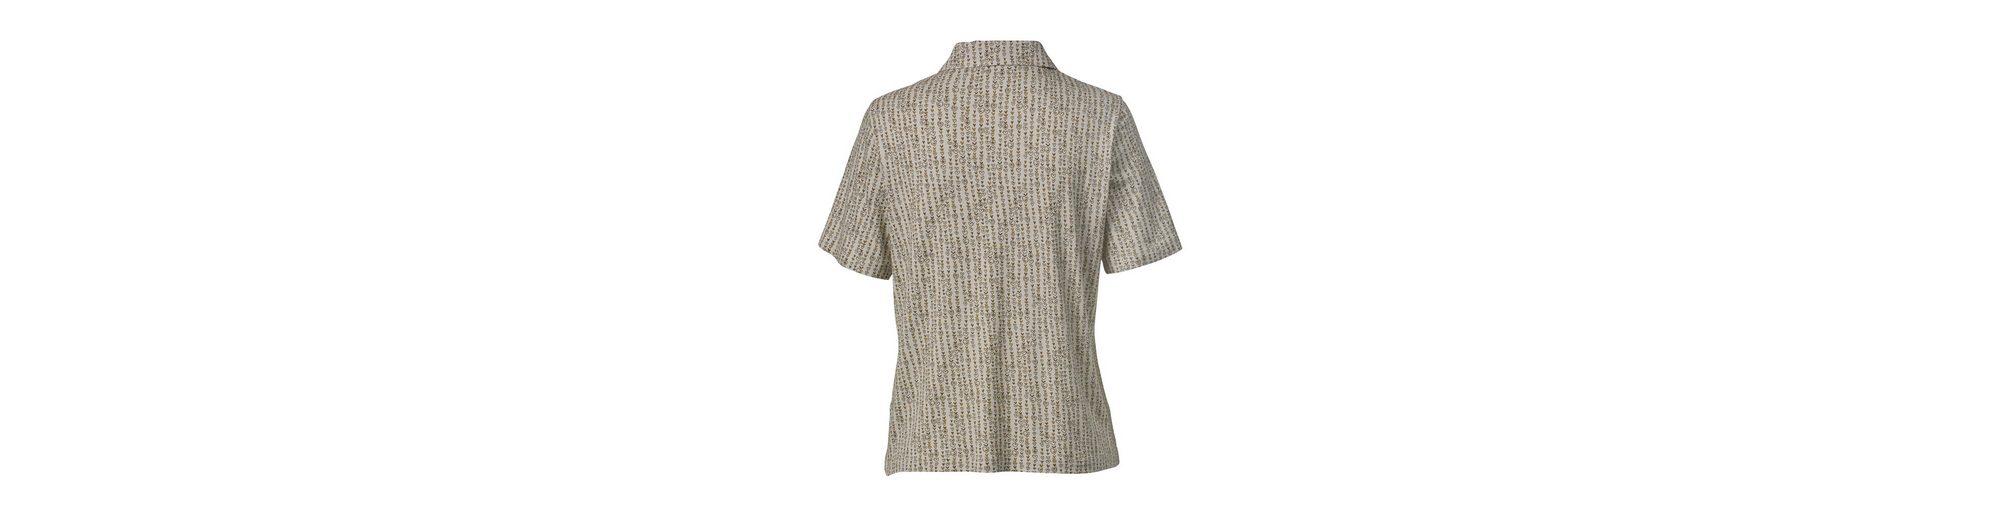 Viscose aus Mona weicher Poloshirt Poloshirt Mona aus xwYaqIpR